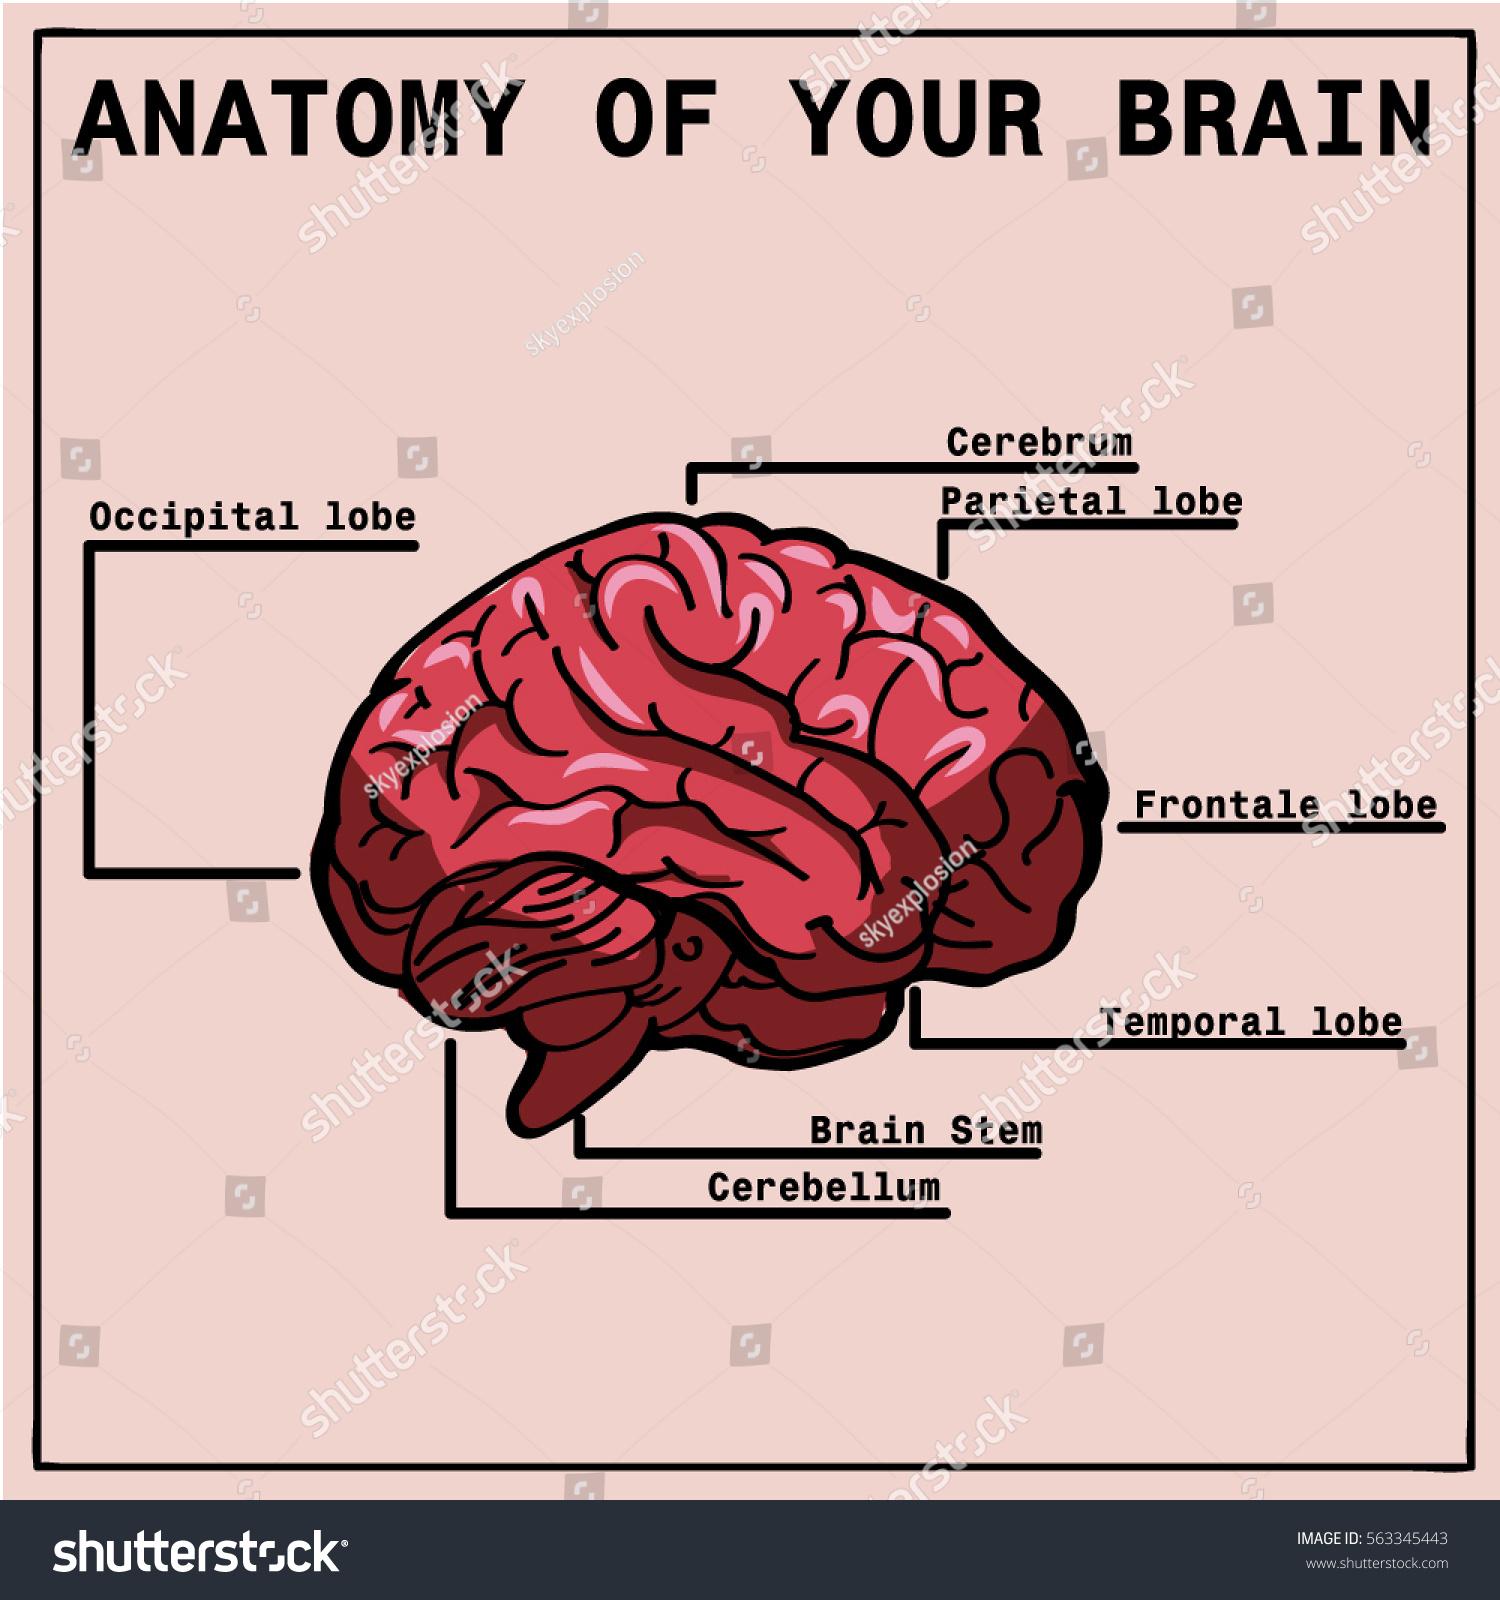 Hypothalamus infographic image. Detailed anatomy of the human brain ...